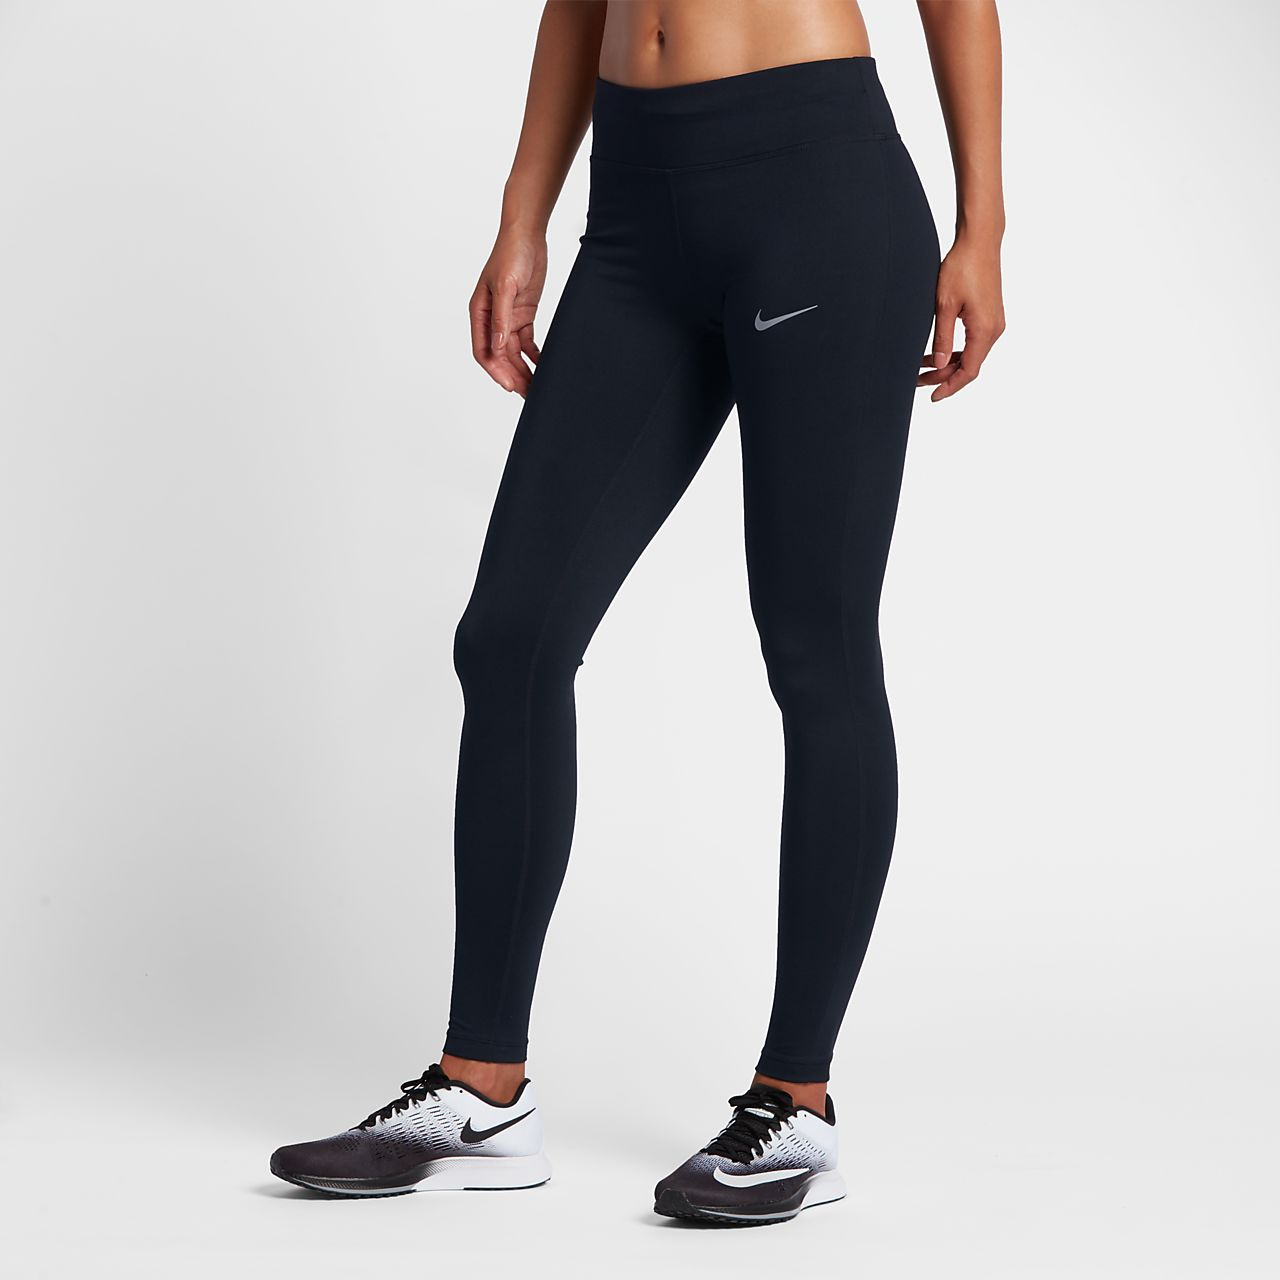 Mujer Nike Medio Essential Talle Es Mallas De Running wzqvaw